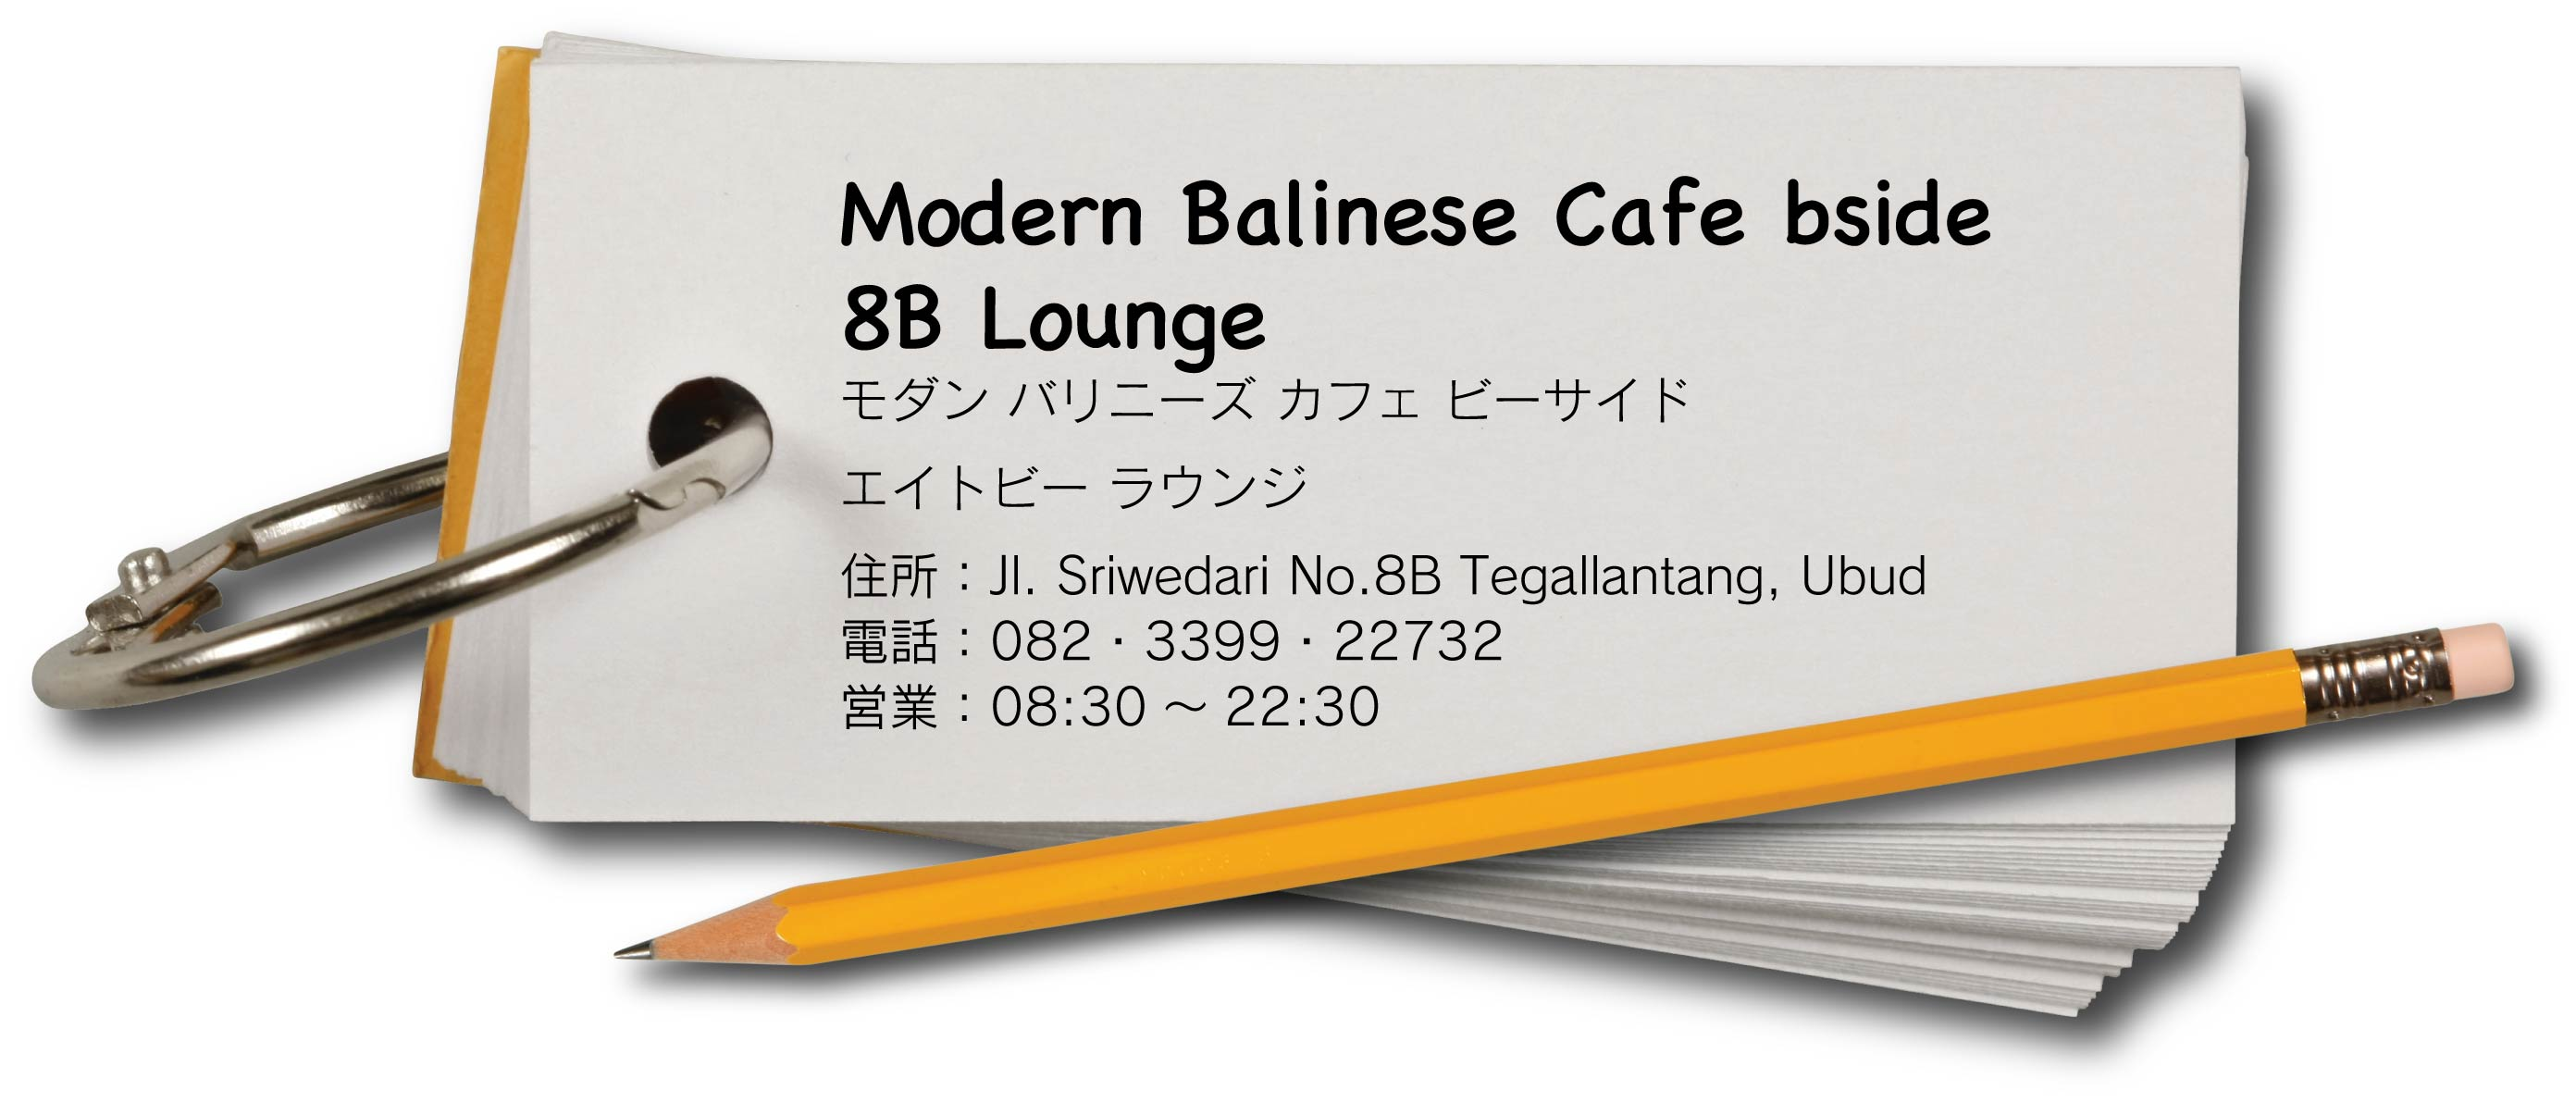 Modern Balinese Cafe bsideの画像10